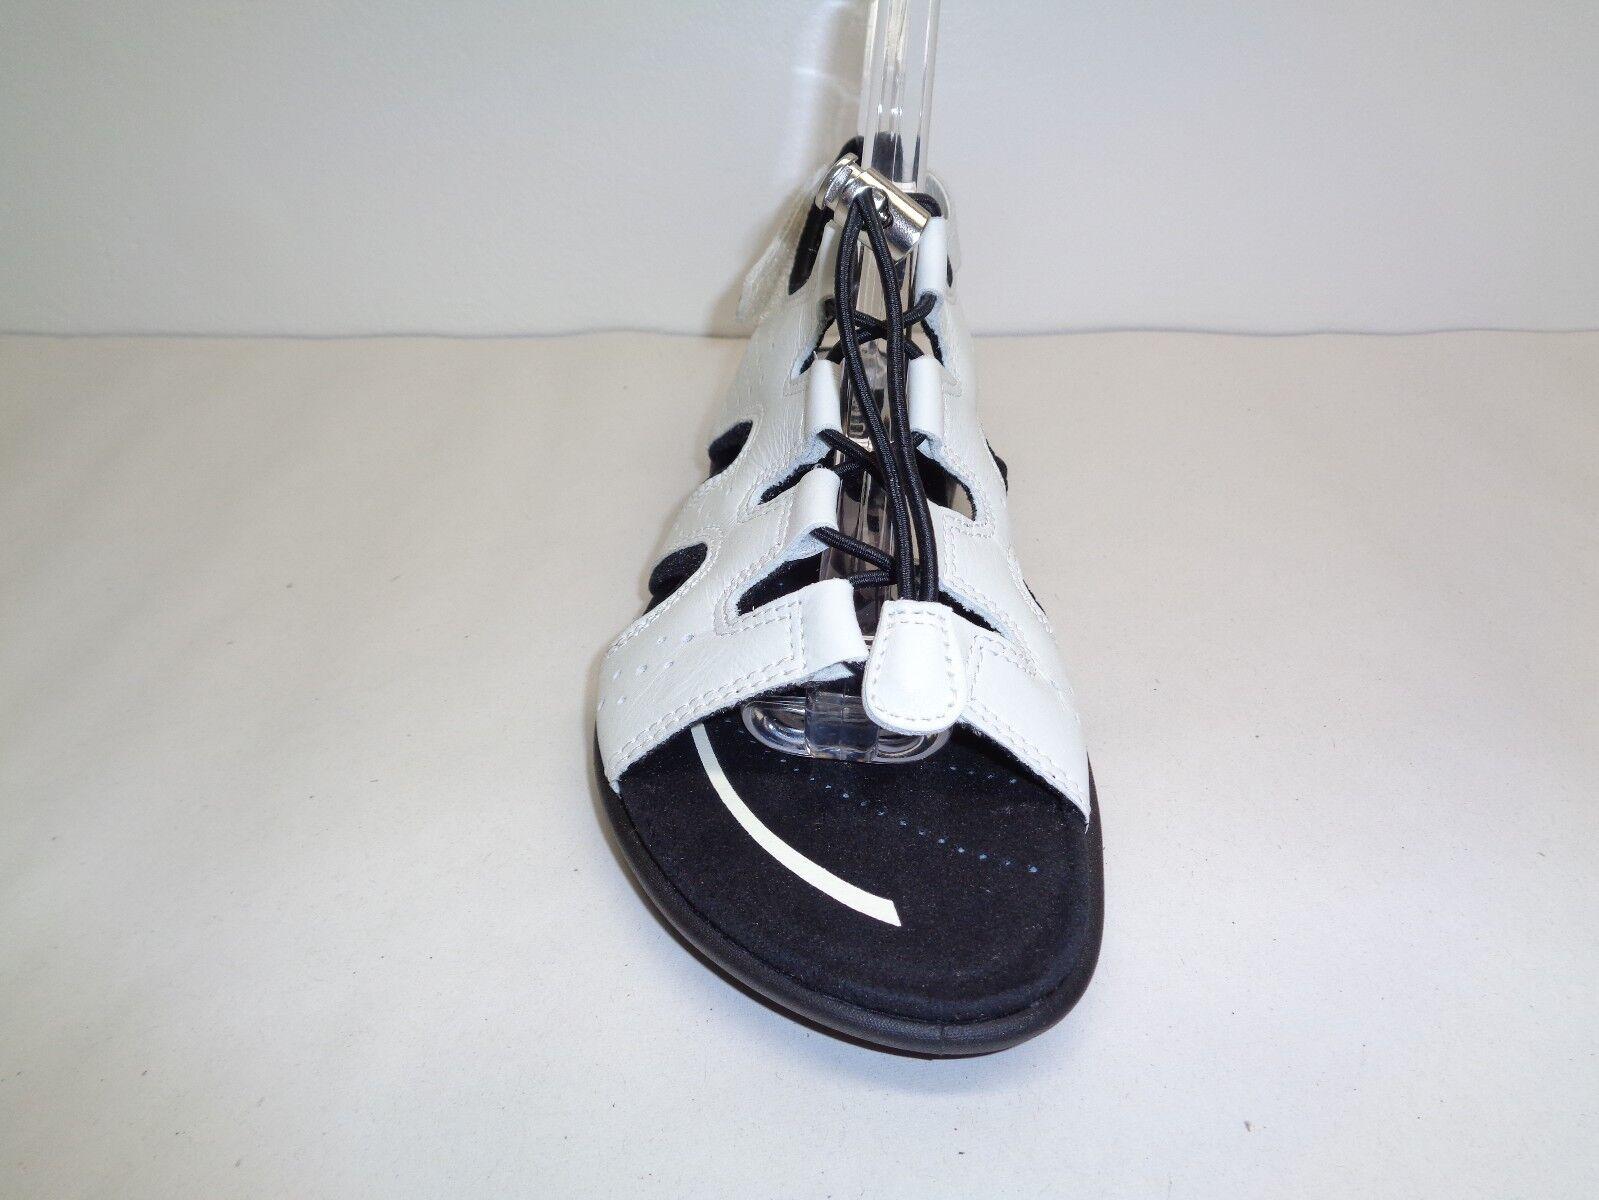 Ecco Size 5 to 5.5 Eur 36 blueMA blueMA blueMA TOGGLE White Leather Sandals New Womens shoes c6fde8